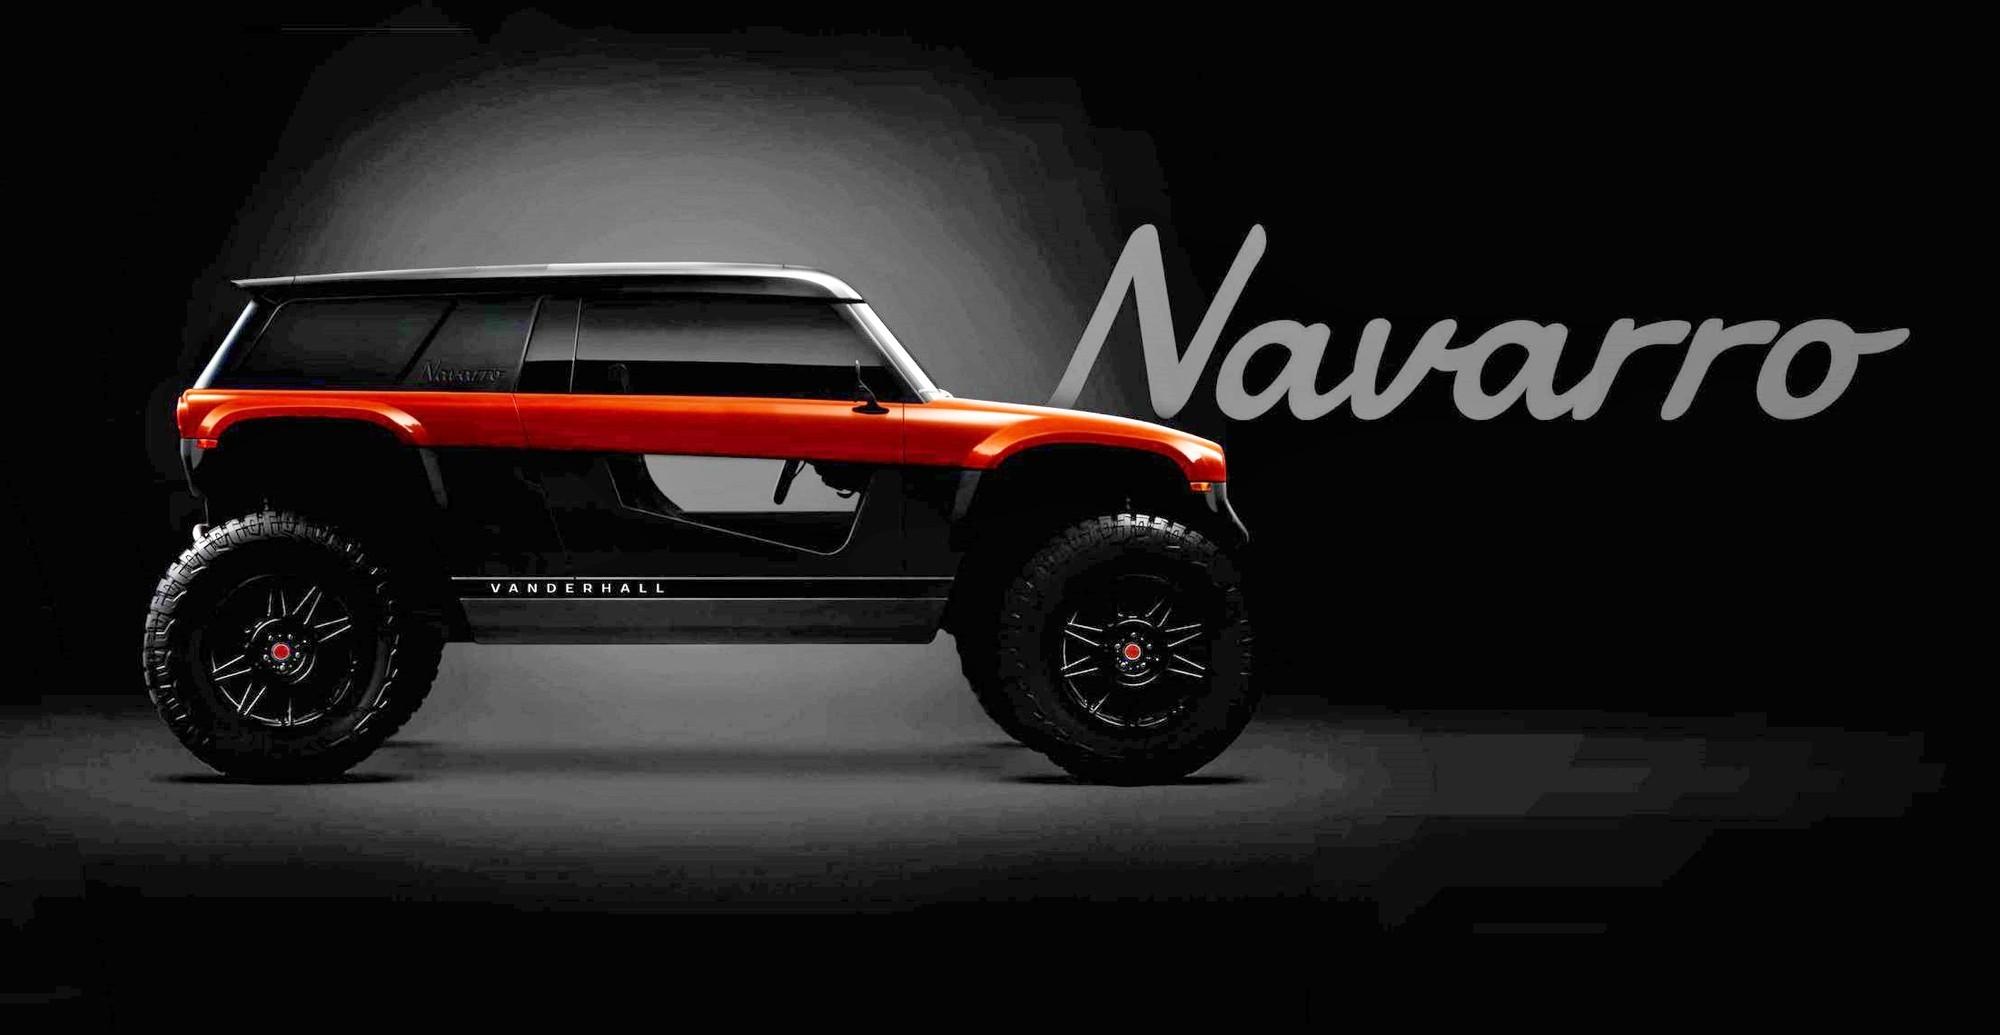 Vanderhall Navarro превзойдёт Ford Bronco и Jeep Wrangler по геометрической проходимости